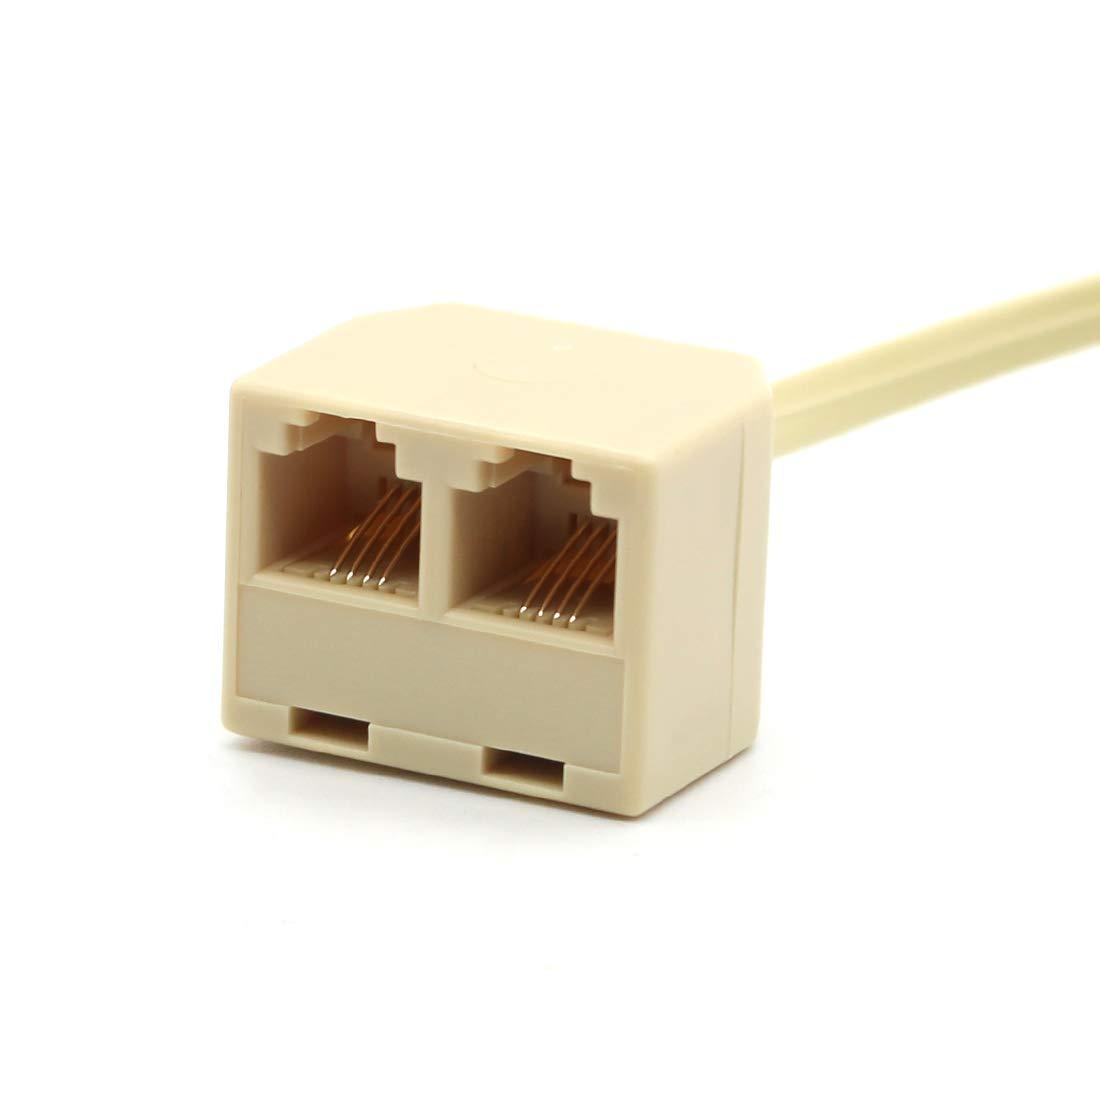 2 of Pack RJ45 to BT RJ11 Secondary Splitter Telephone Adapter RJ45 Plug Male TO BT RJ11 Femle Cord Separator for Converter RJ45 wall Socket to BT RJ11 Socket Connector Ethernet Secondary Phone Line